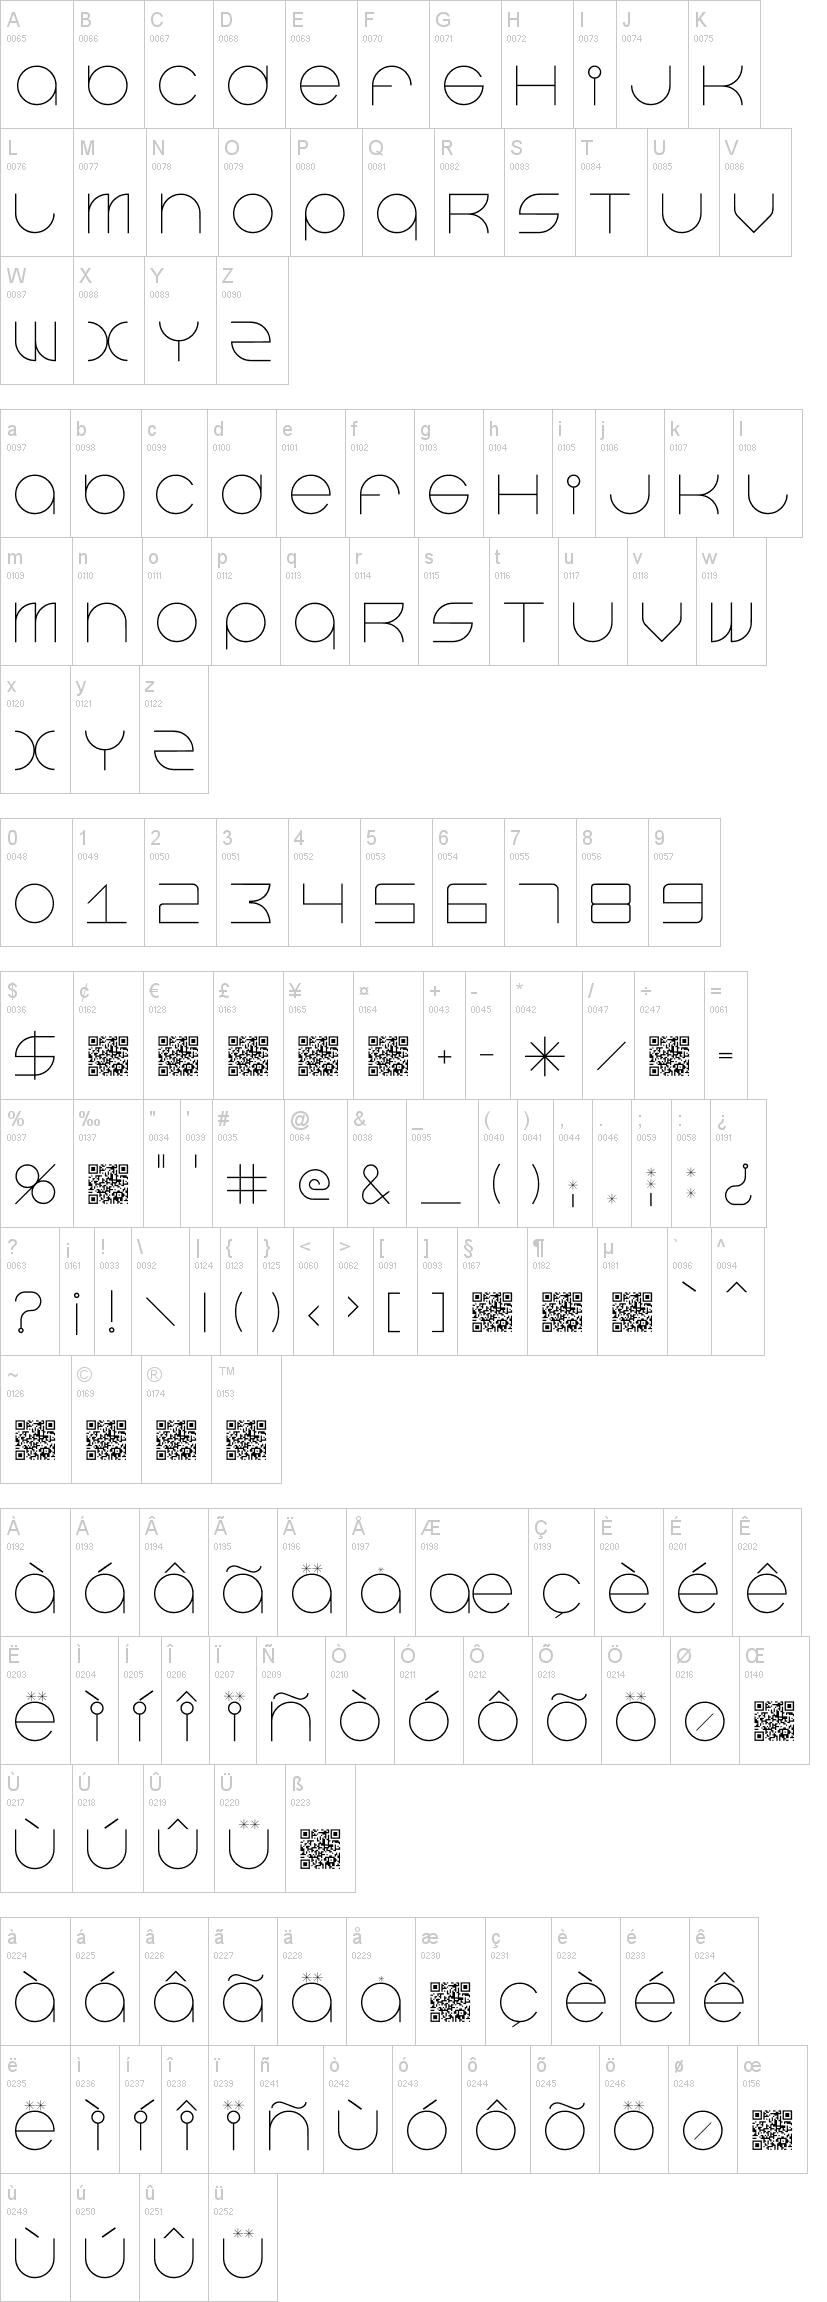 Beast Mode Suite Font | dafont com